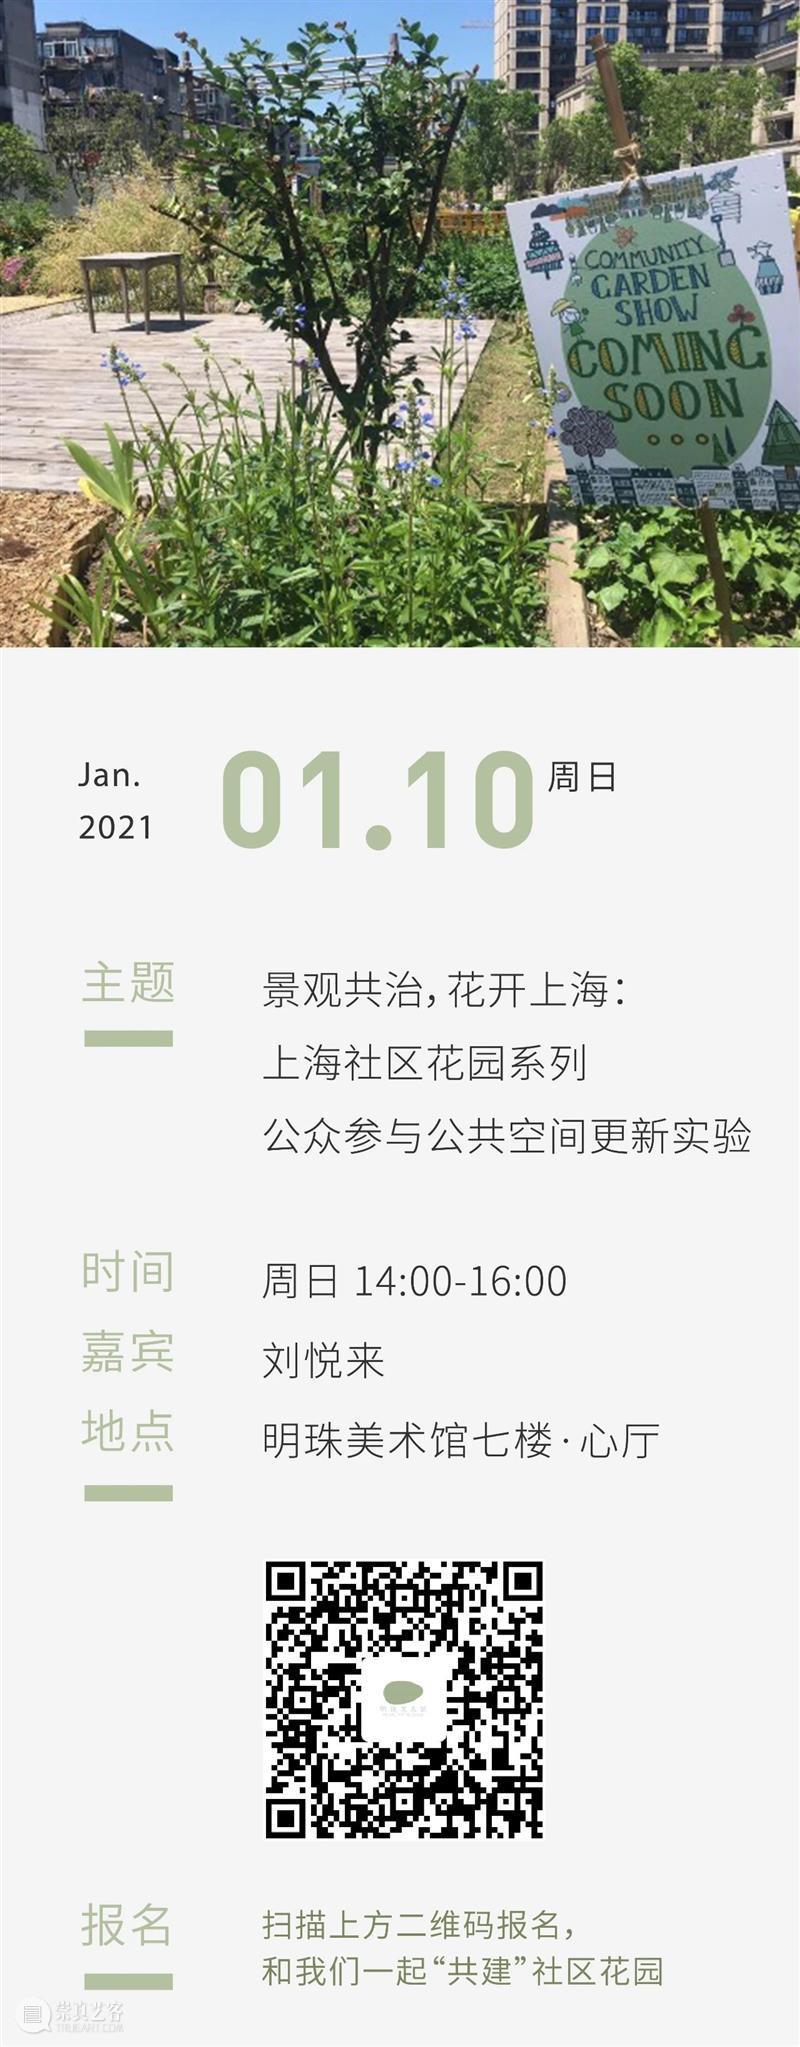 PAM Lecture 刘悦来:景观共治,花开上海——上海社区花园系列公众参与公共空间更新实验 空间 景观 花园 刘悦来 上海社区 上海 系列 公众 实验 PAM 崇真艺客